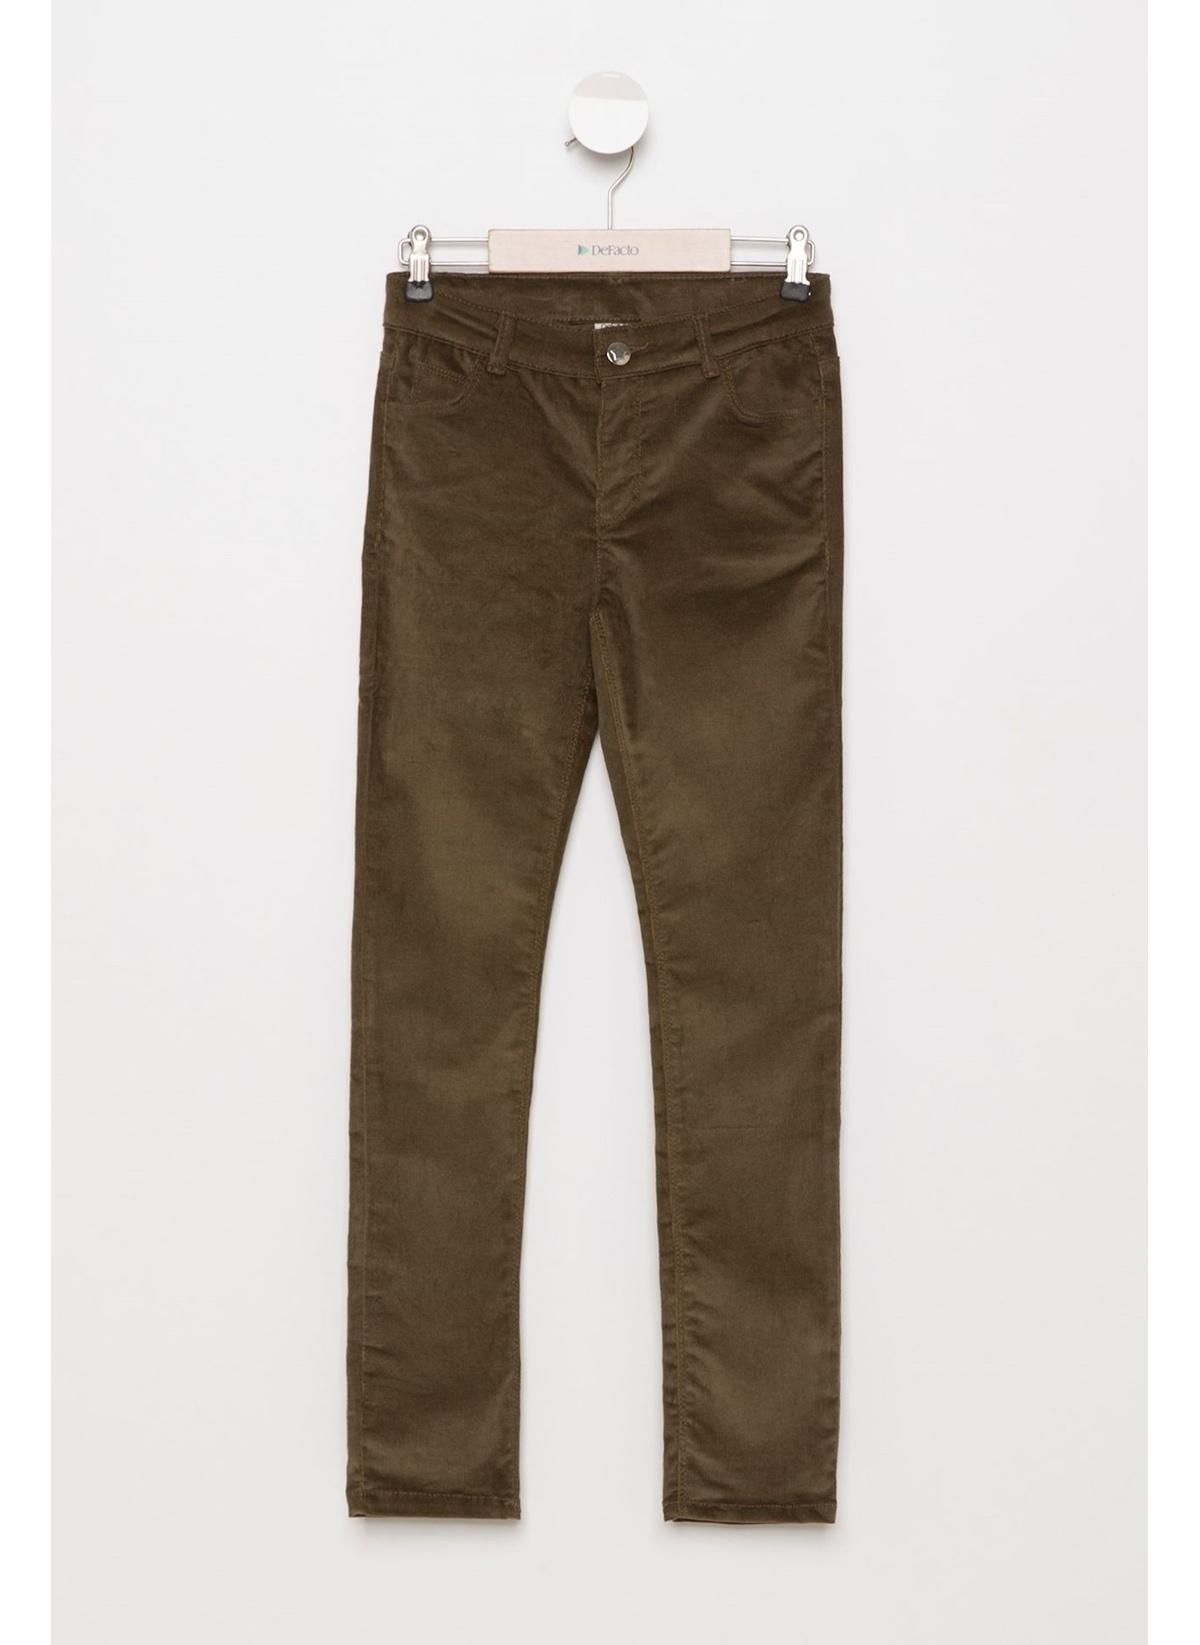 Defacto Kadife 5 Cep Pantolon H3784a617wnkh196 Kadife 5 Cep Pantolon – 24.99 TL